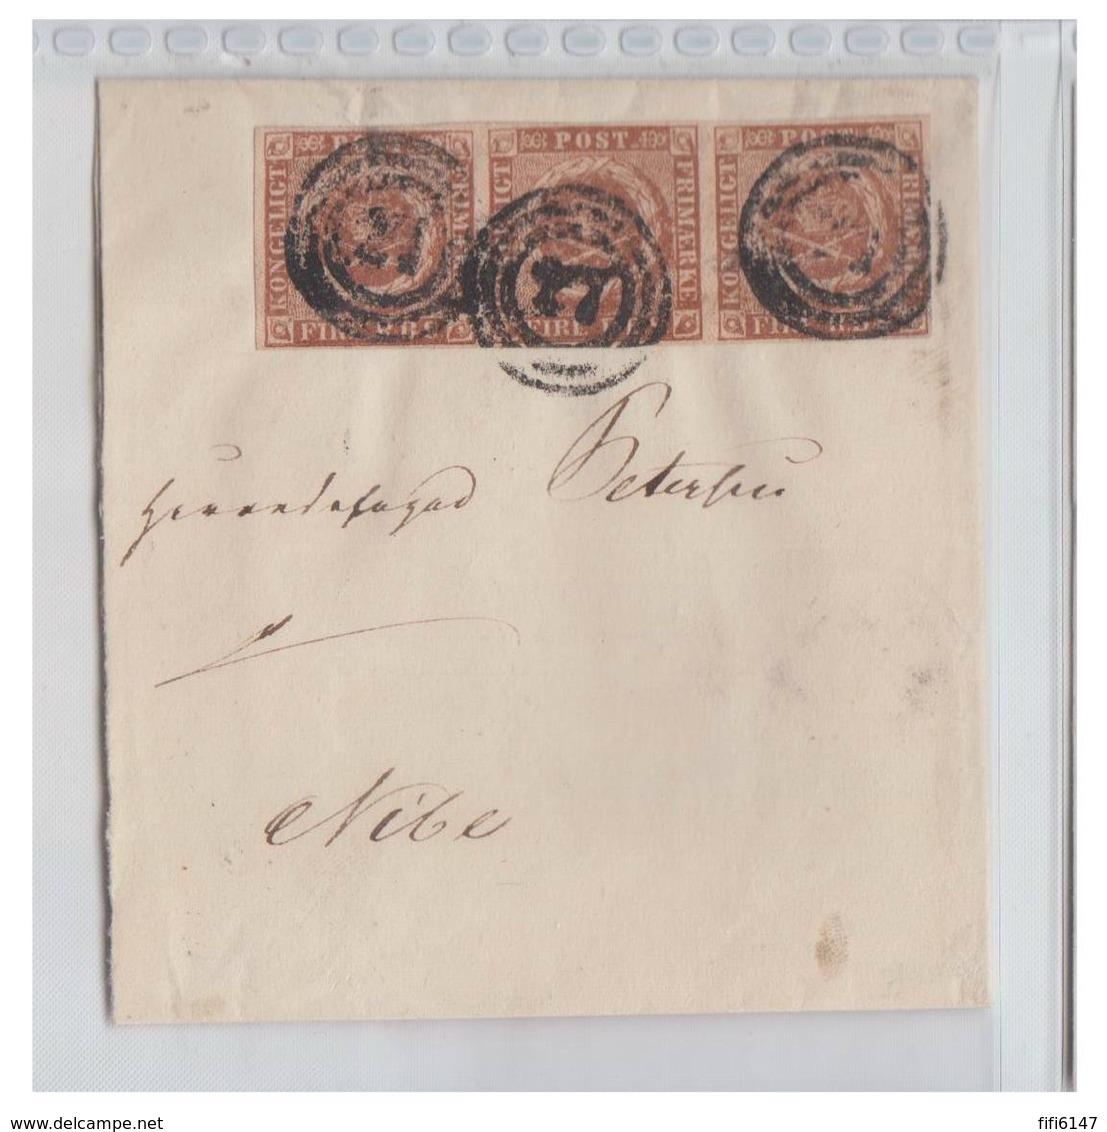 DANEMARK -1854--FIRE R.B.S. --PLANCHE III -- BANDE DE TROIS SUR GRAND FRAGMENT-- - 1851-63 (Frederik VII)